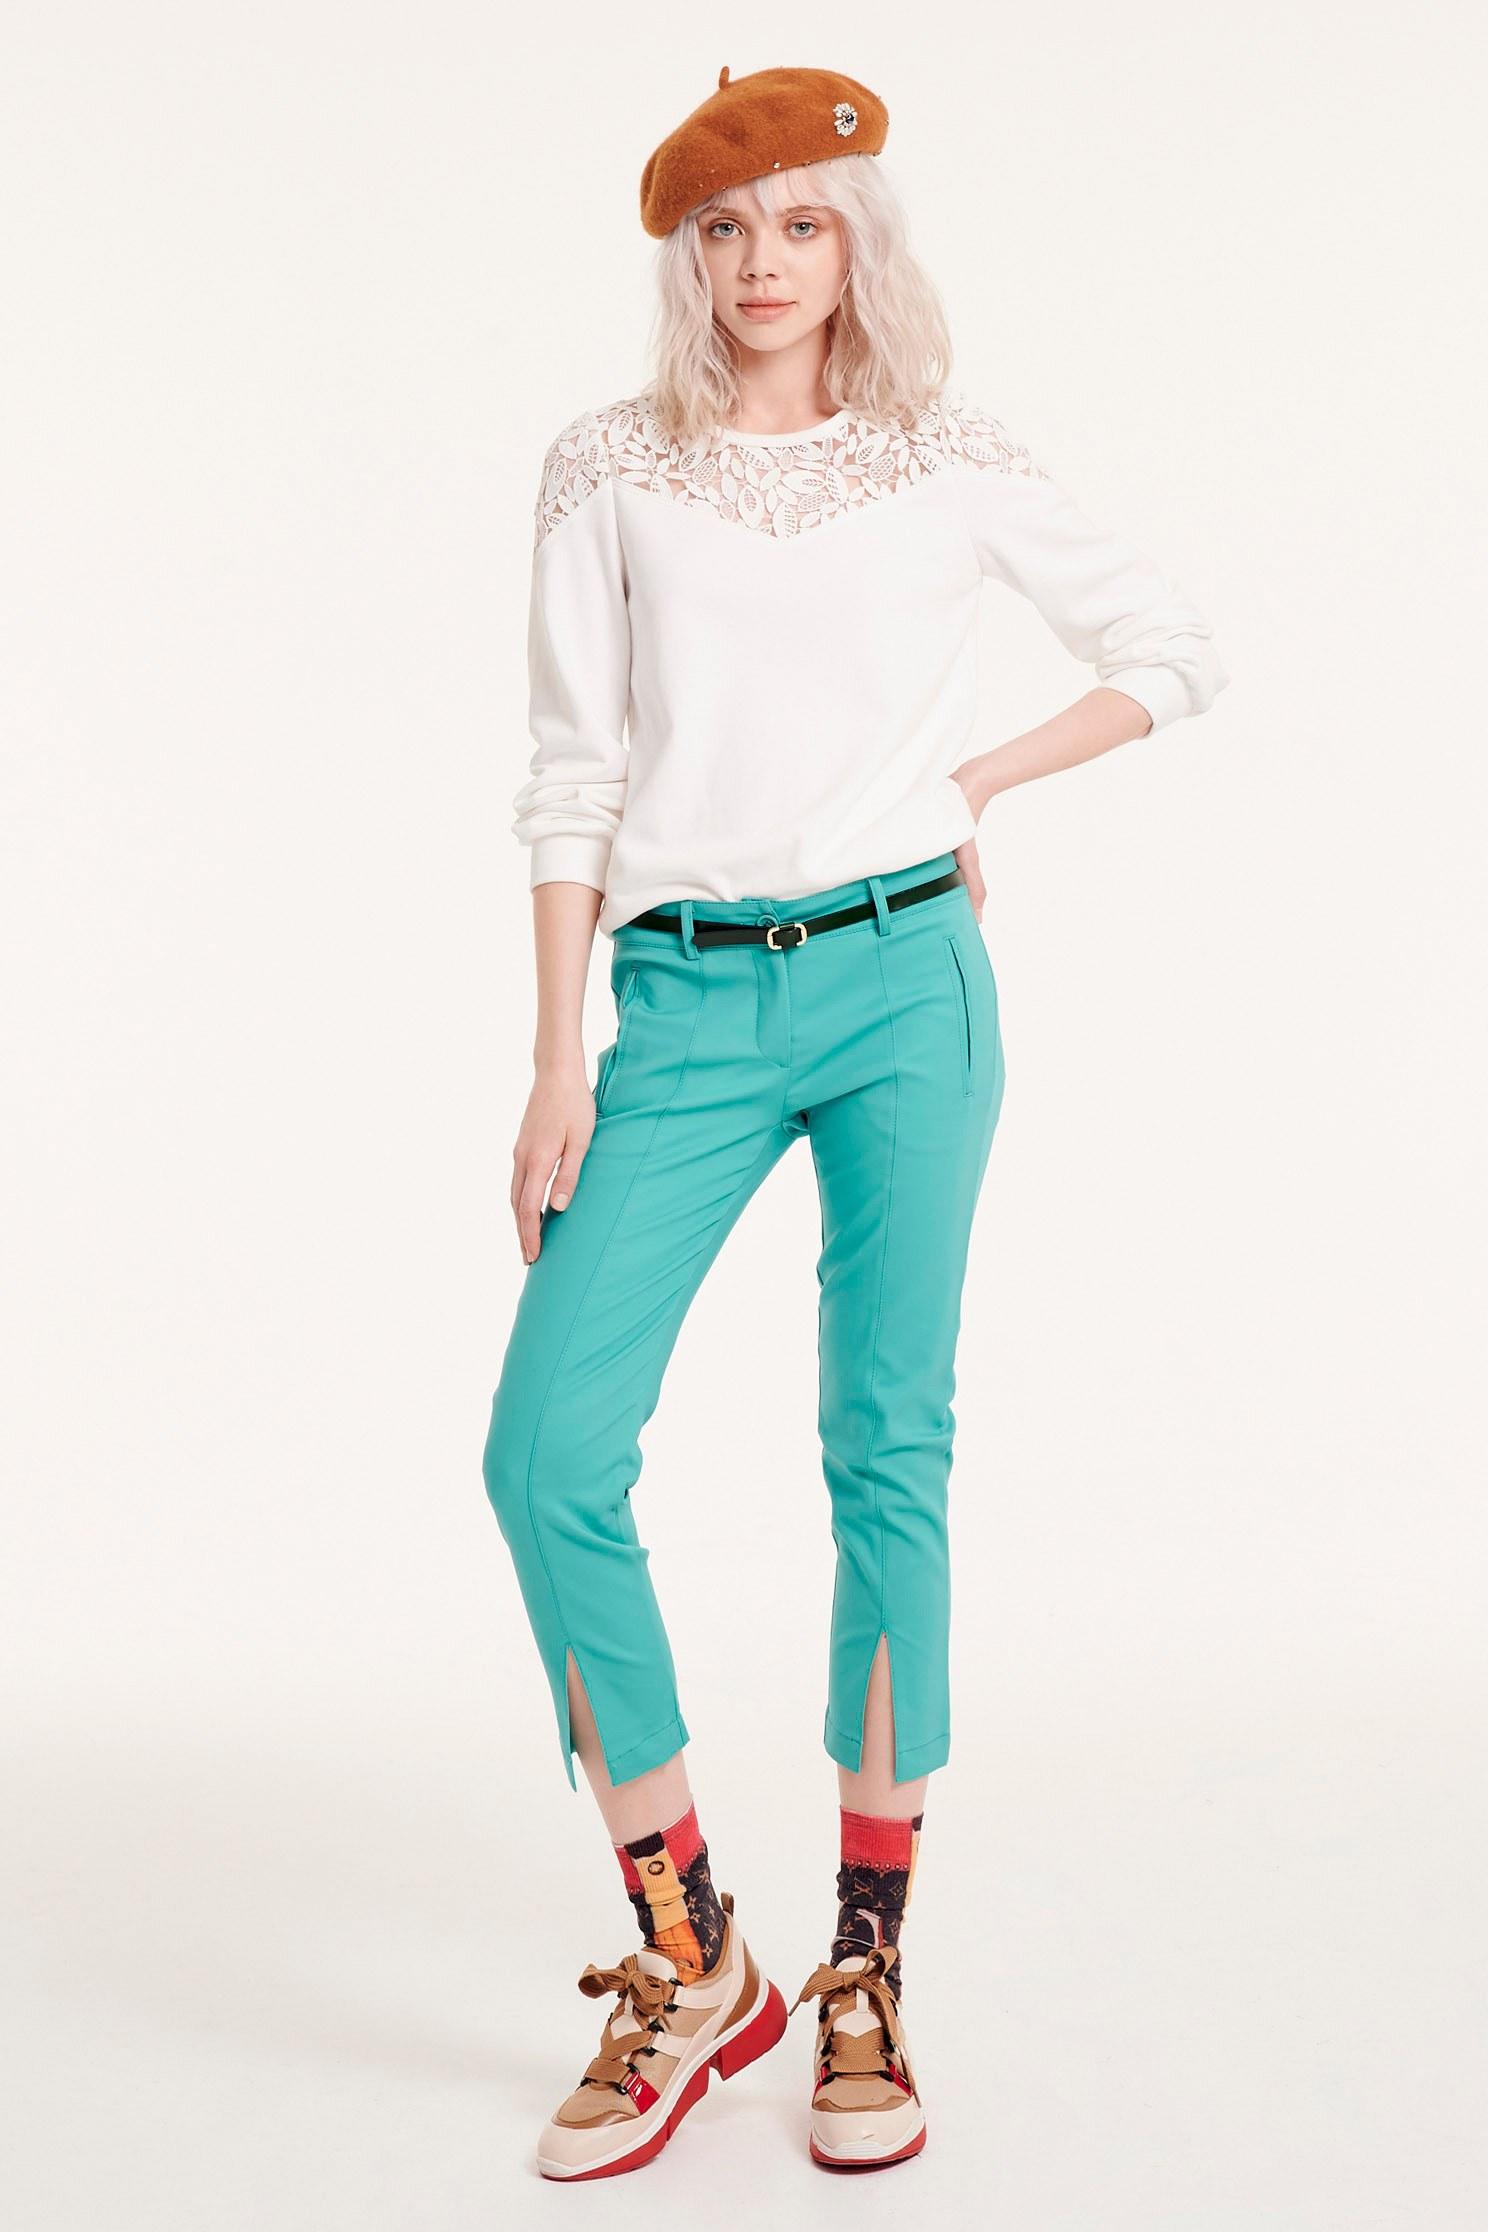 Lace SWEATER,七分袖上衣,Top,圓領上衣,白色上衣,Lace,Laced Top